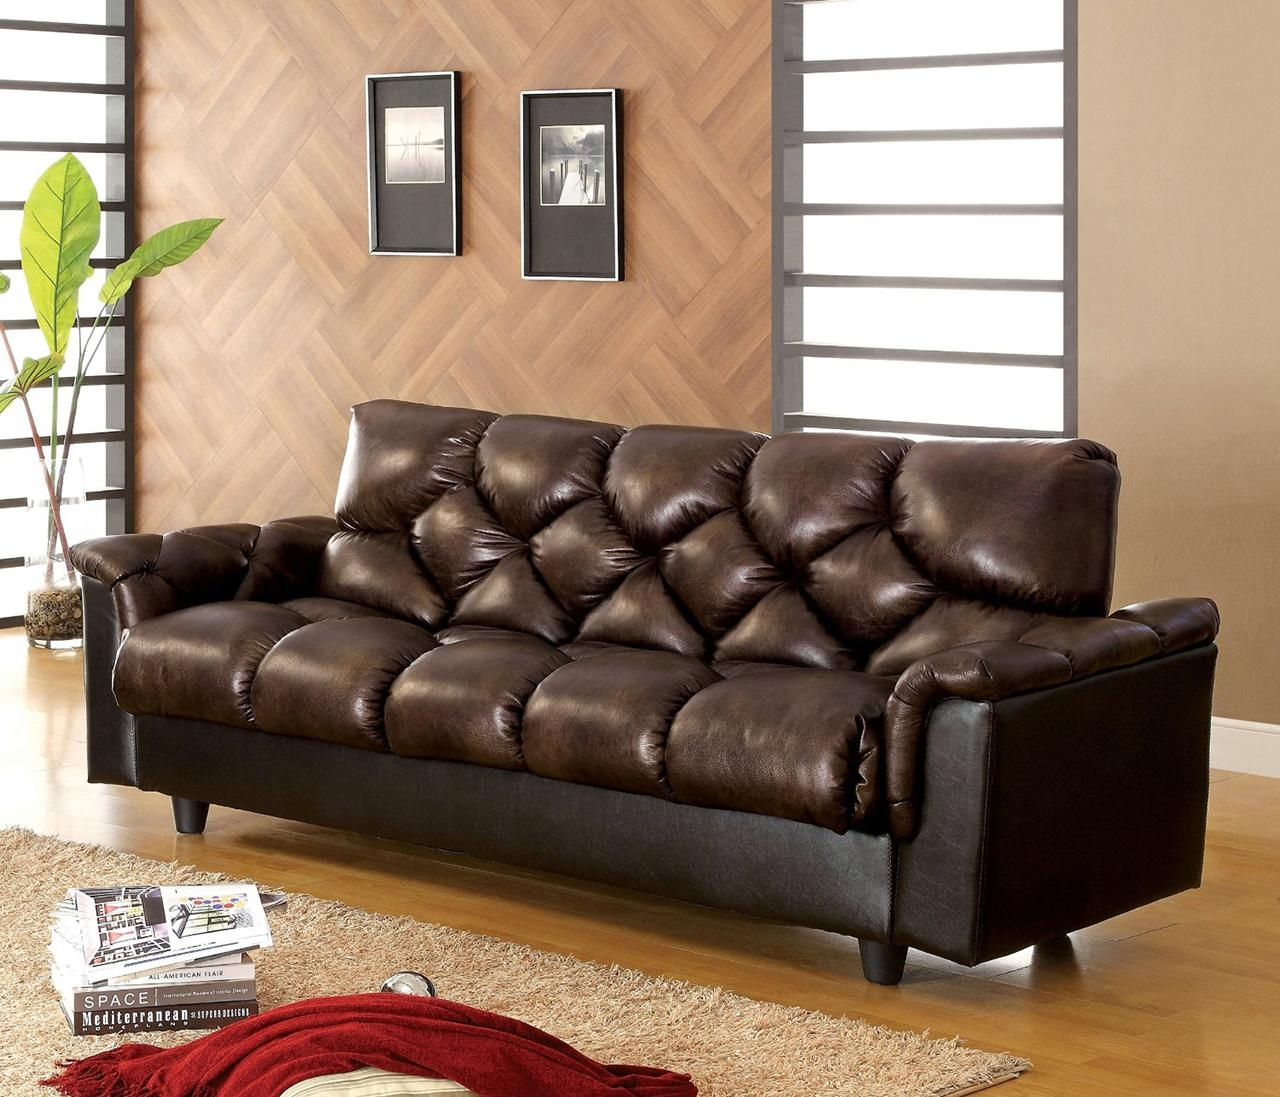 25 Best Sleeper Sofa Beds To Buy In 2017 Regarding Everyday Sleeper Sofas (Image 1 of 20)